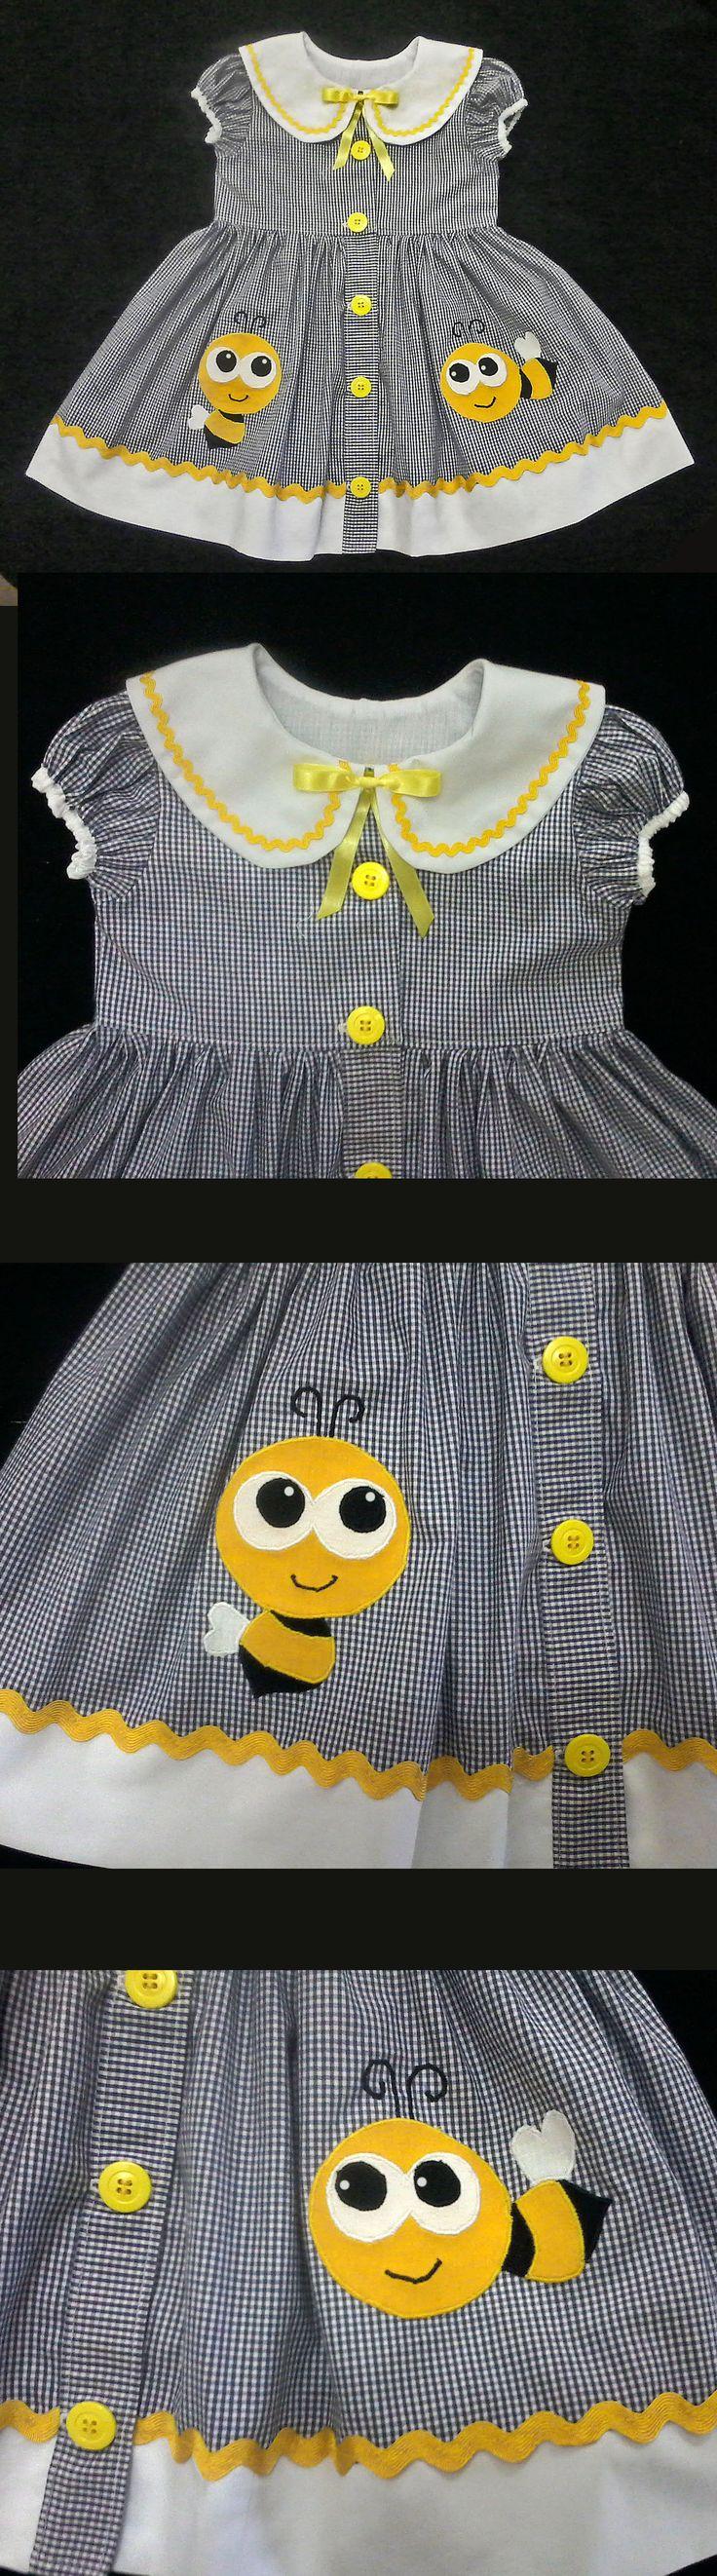 Vestido Aplicação Abelhinha - Bumble Bee Dress - - - - - - - - - - - Molde grátis no grupo do facebook (free pattern in facebook group)  https://www.facebook.com/groups/1594730384185604/  ..........................  (RLevyFile-VestidoAbelhinha3anos-HappyBumbleBeeDress3years)  ........................... baby - infant - toddler clothes for girls - vestido - menina